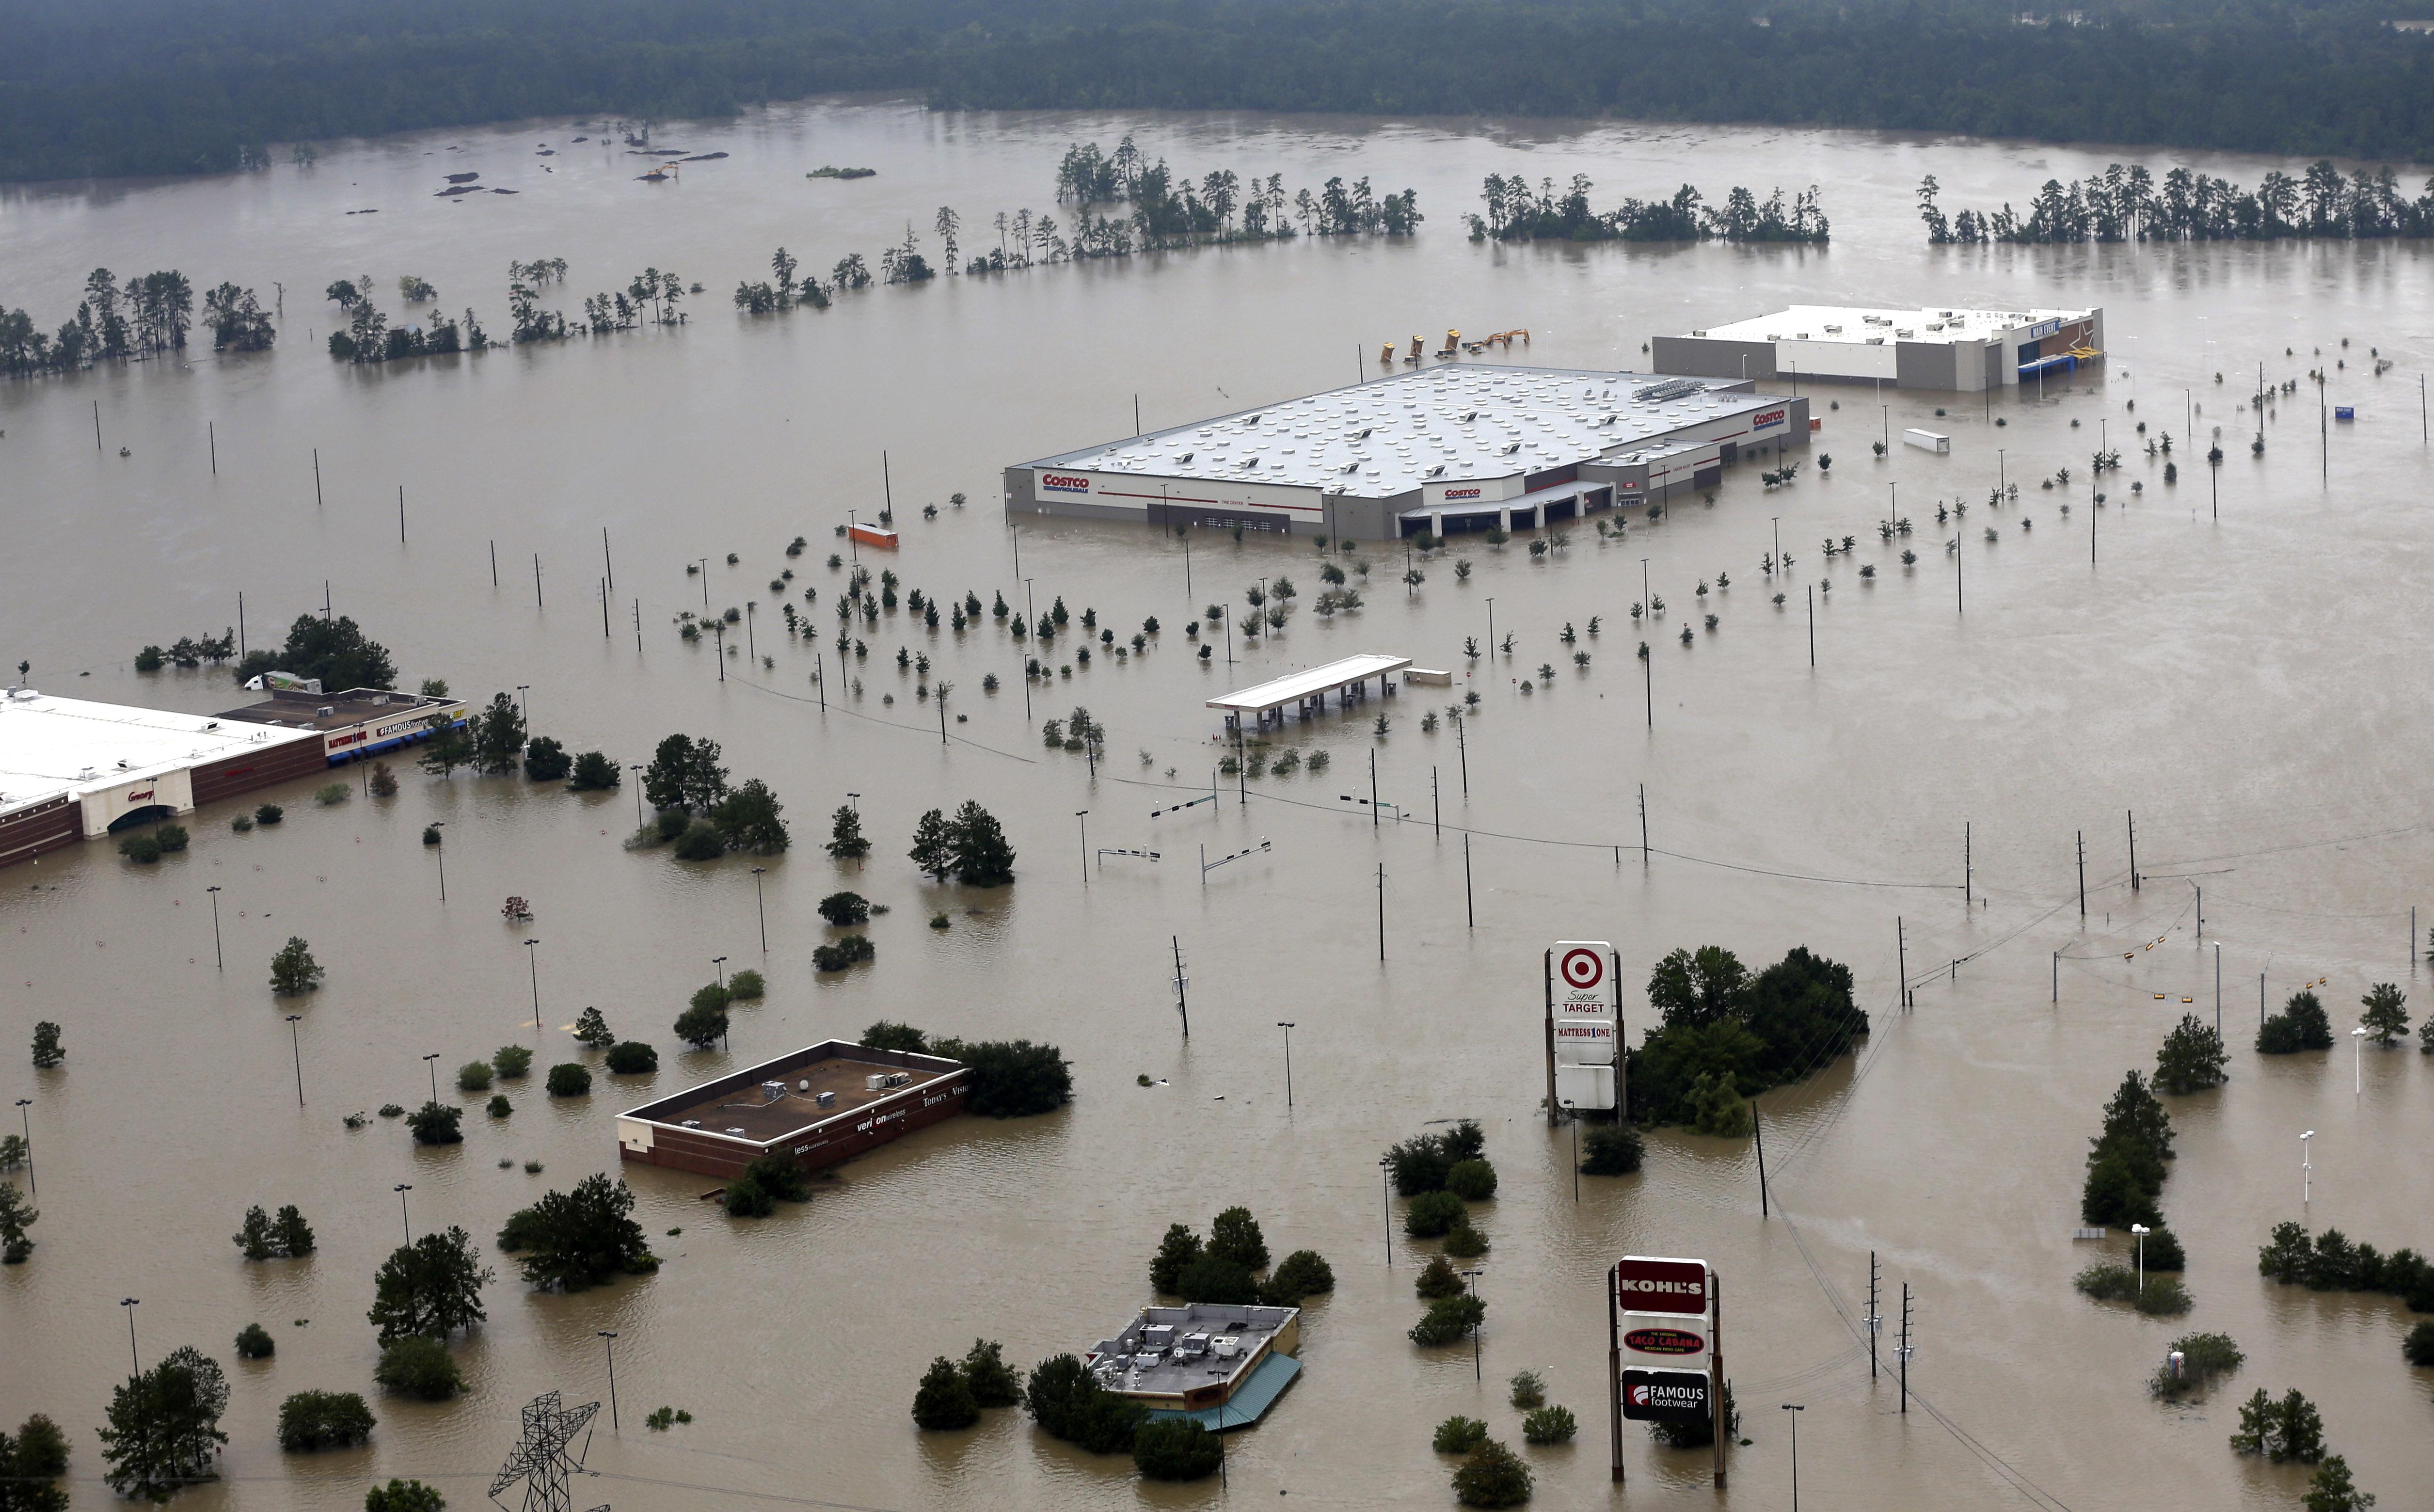 https://www.univision.com/noticias/huracan-harvey/louisiana-ofrece ...